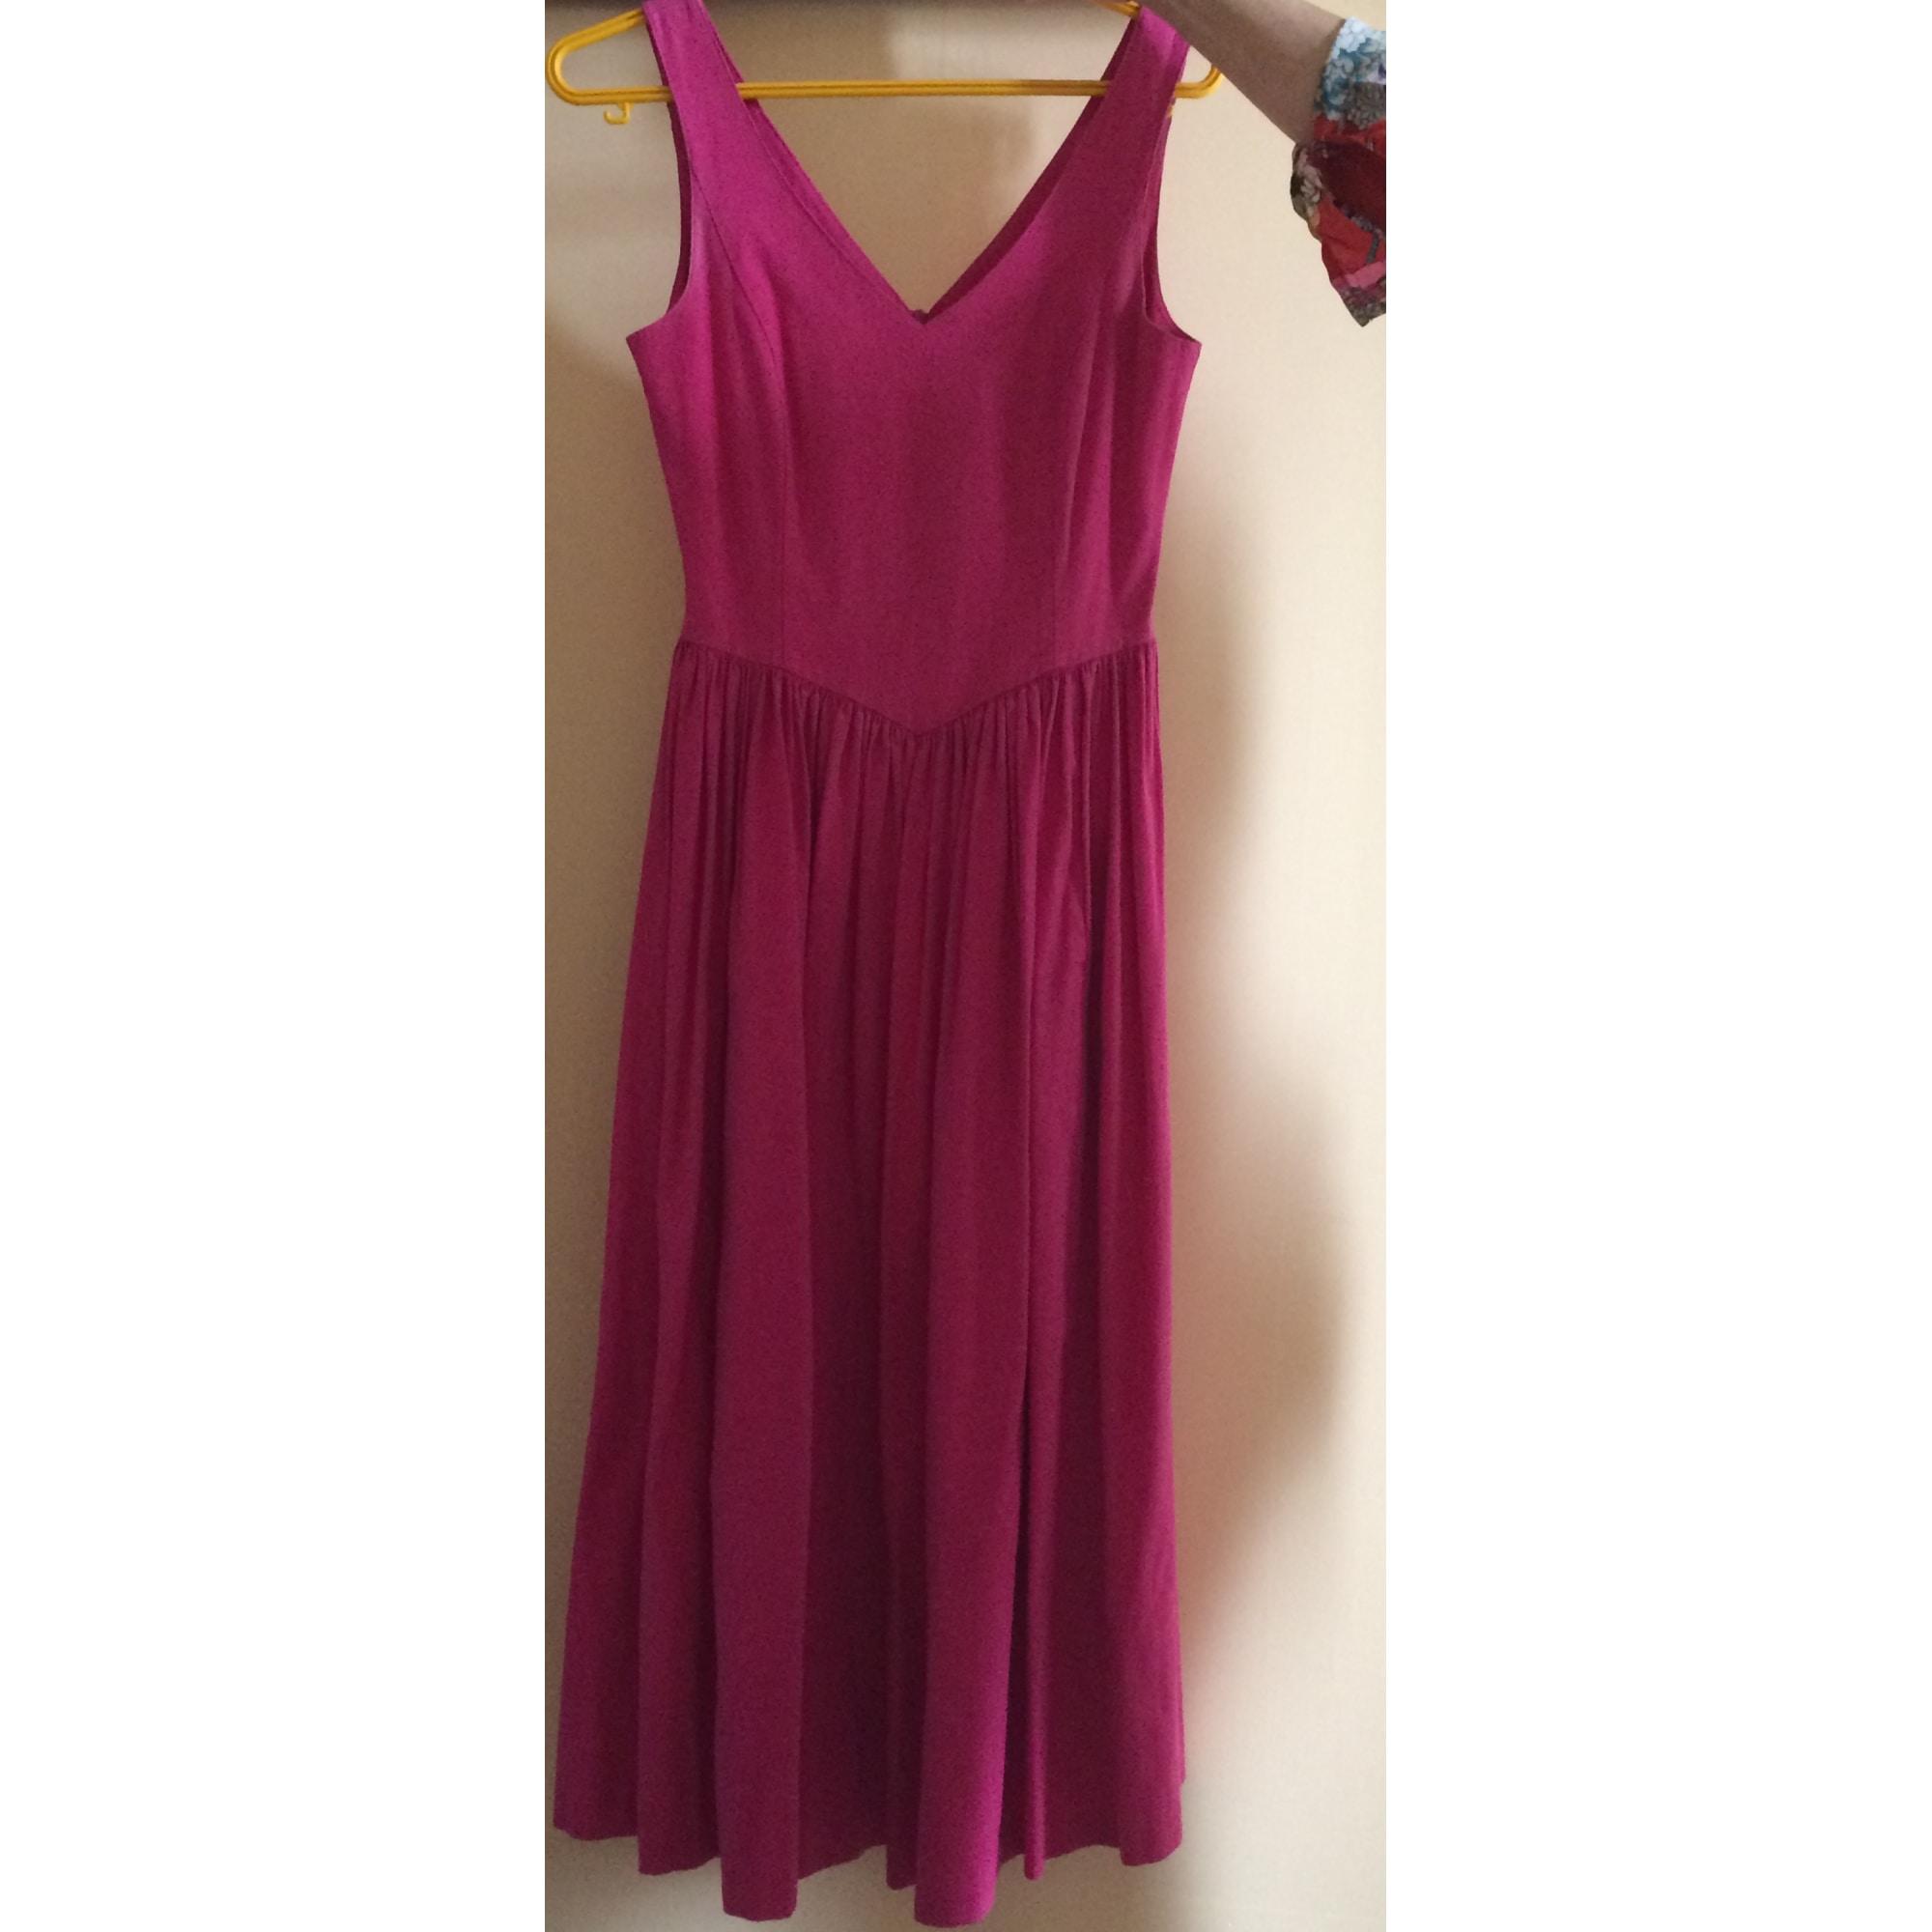 maxi kleid laura ashley 36 s t1 pink 3528927. Black Bedroom Furniture Sets. Home Design Ideas